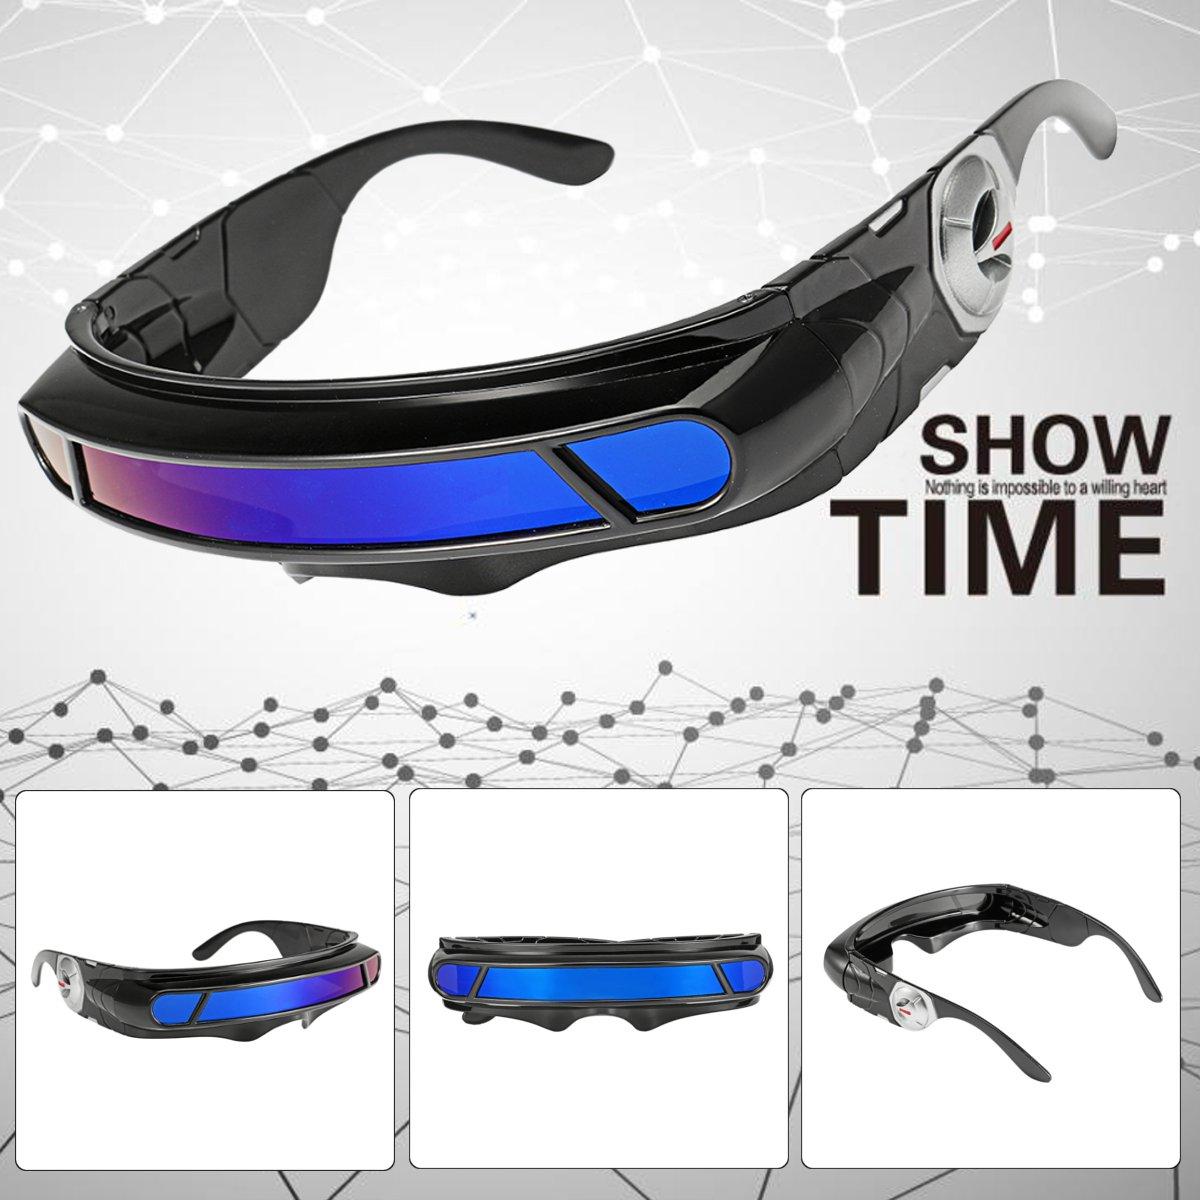 Cyclops visor clipart stock Details about Futuristic Space Alien Costume Party Cyclops Robot Wrap  Shield Sun Glasses Visor stock